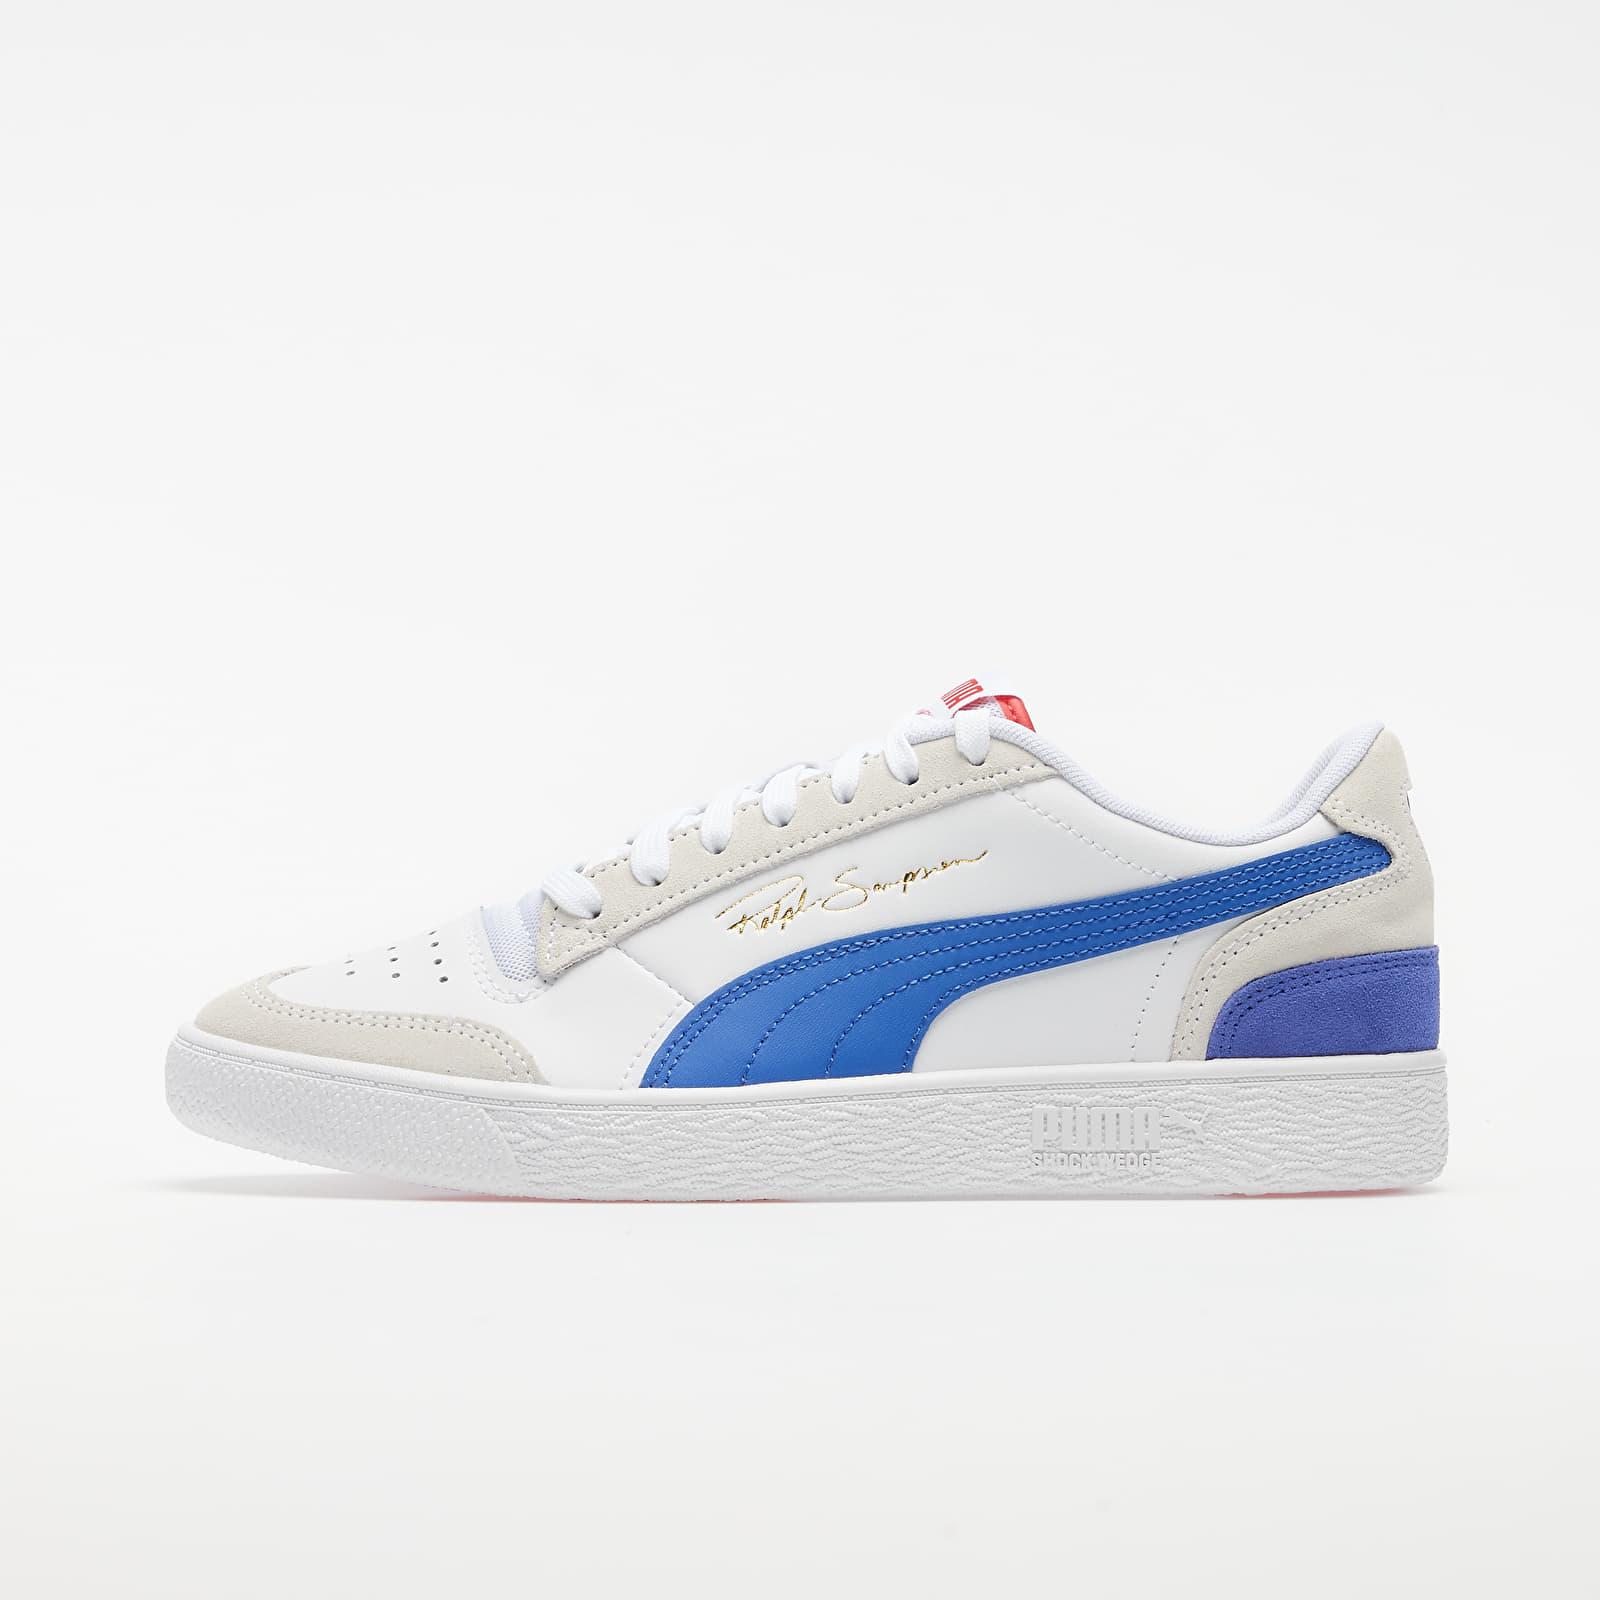 Pánské tenisky a boty Puma Ralph Sampson Lo Vintage Puma White-Dazzling Blue